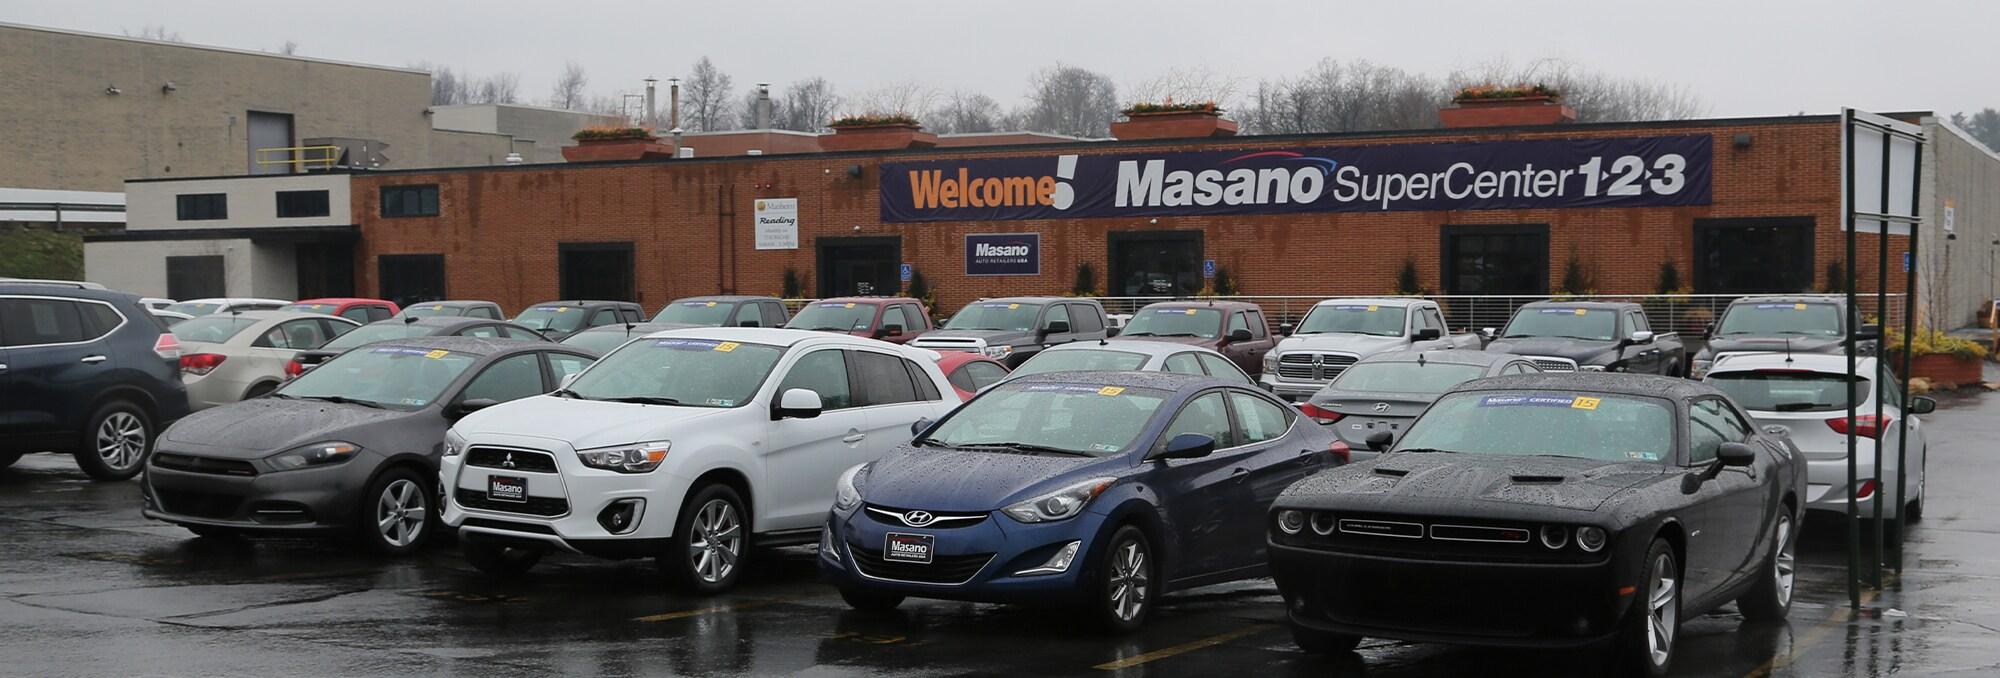 Tom Masano Used Cars >> My Used Car Dealership Tom Masano Ford Used Cars Used Trucks